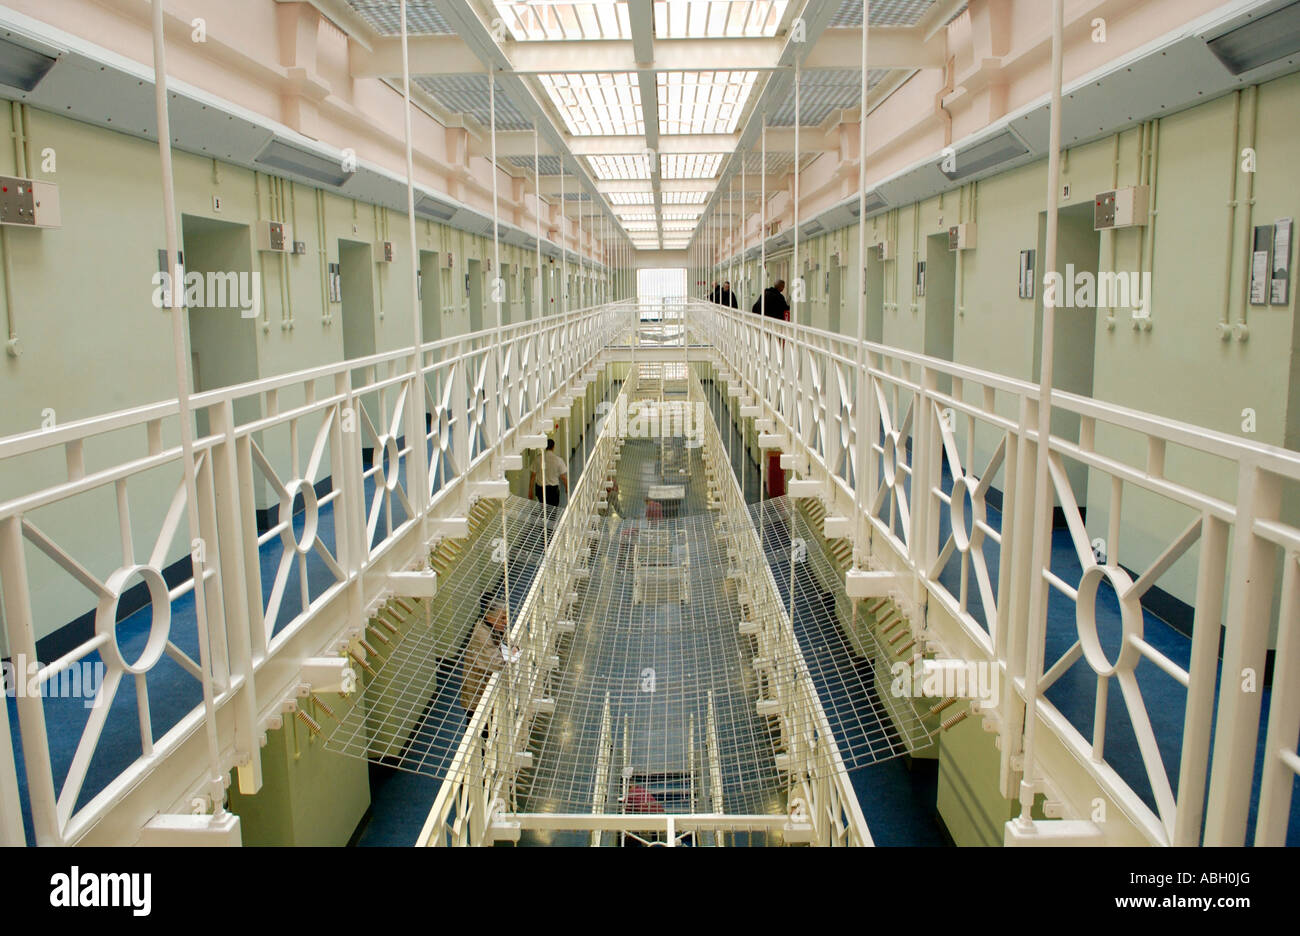 view-of-wing-landing-in-cardiff-prison-south-wales-uk-gb-uk-ABH0JG.jpg